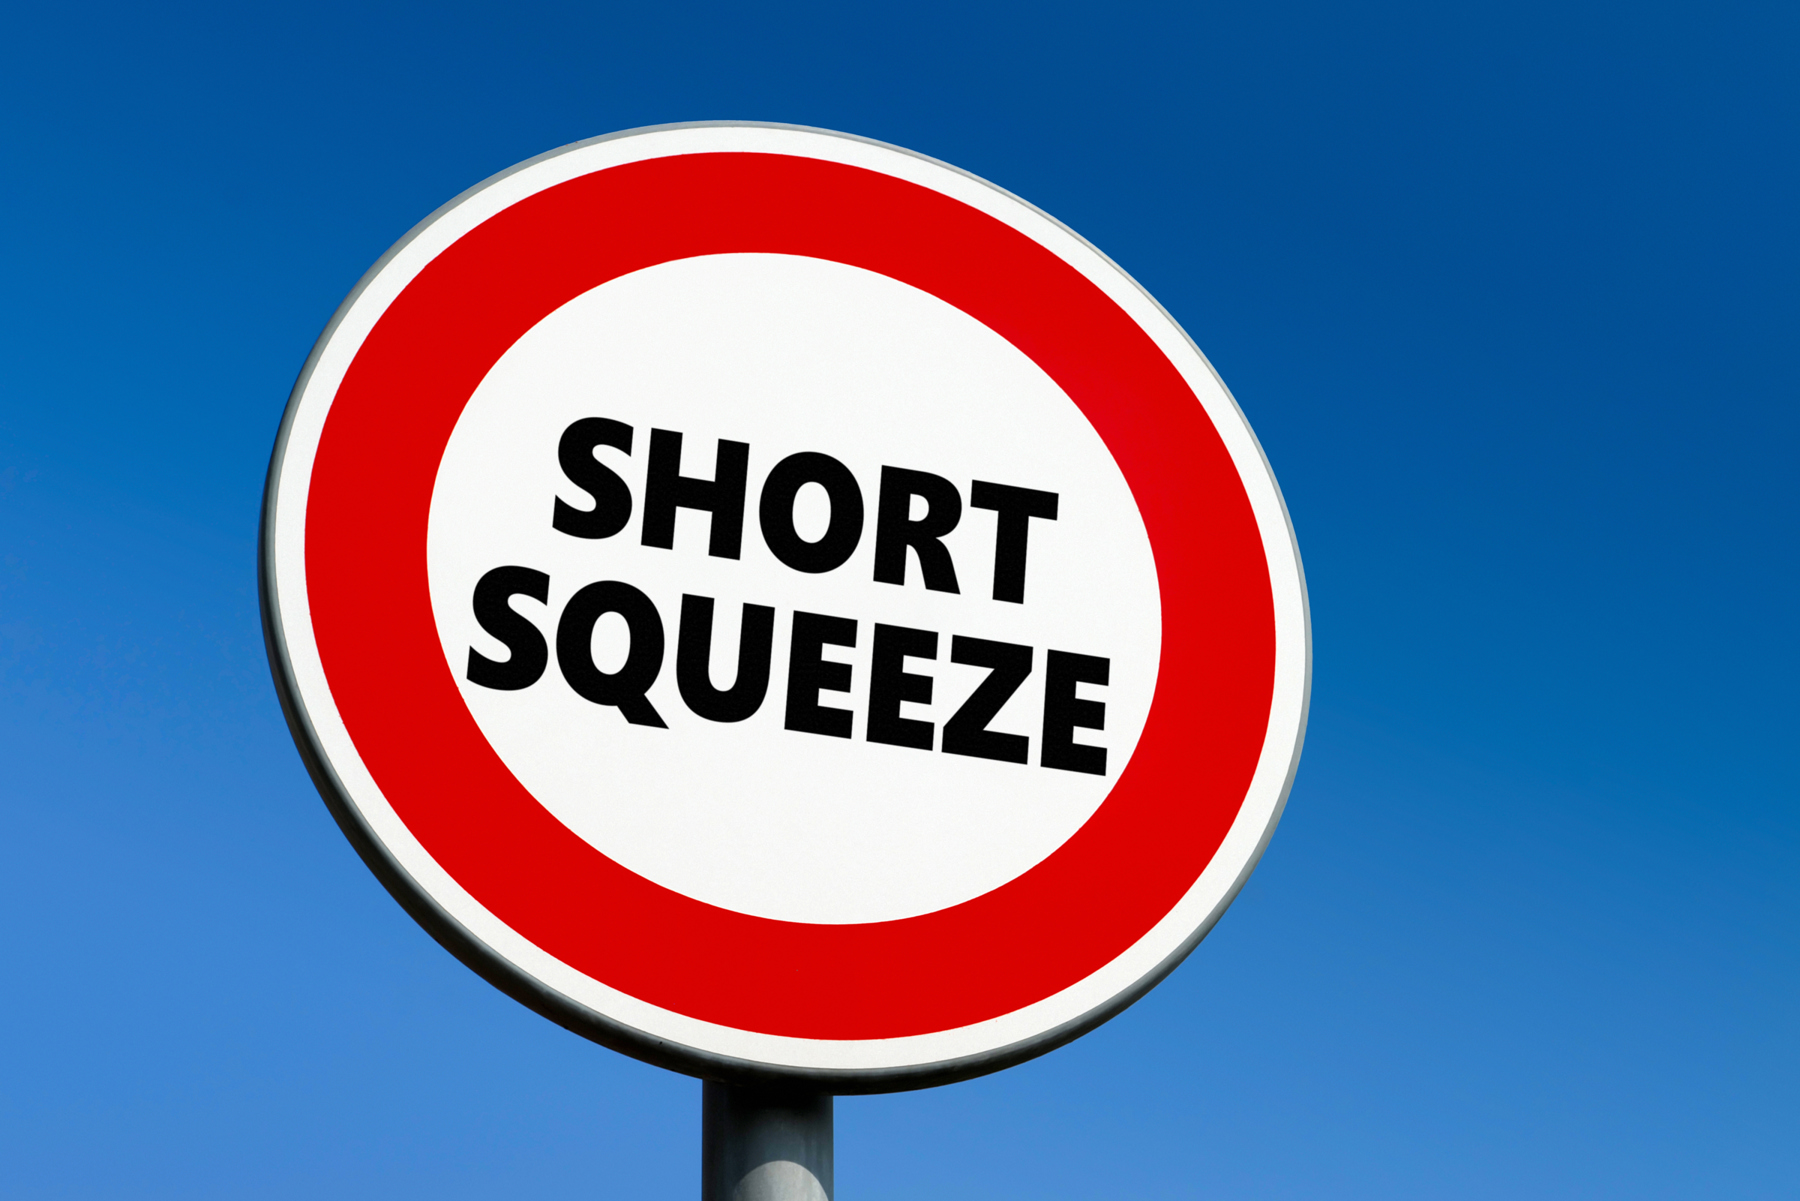 Short squeeze potential, reddit, meme stocks, wallstreetbets